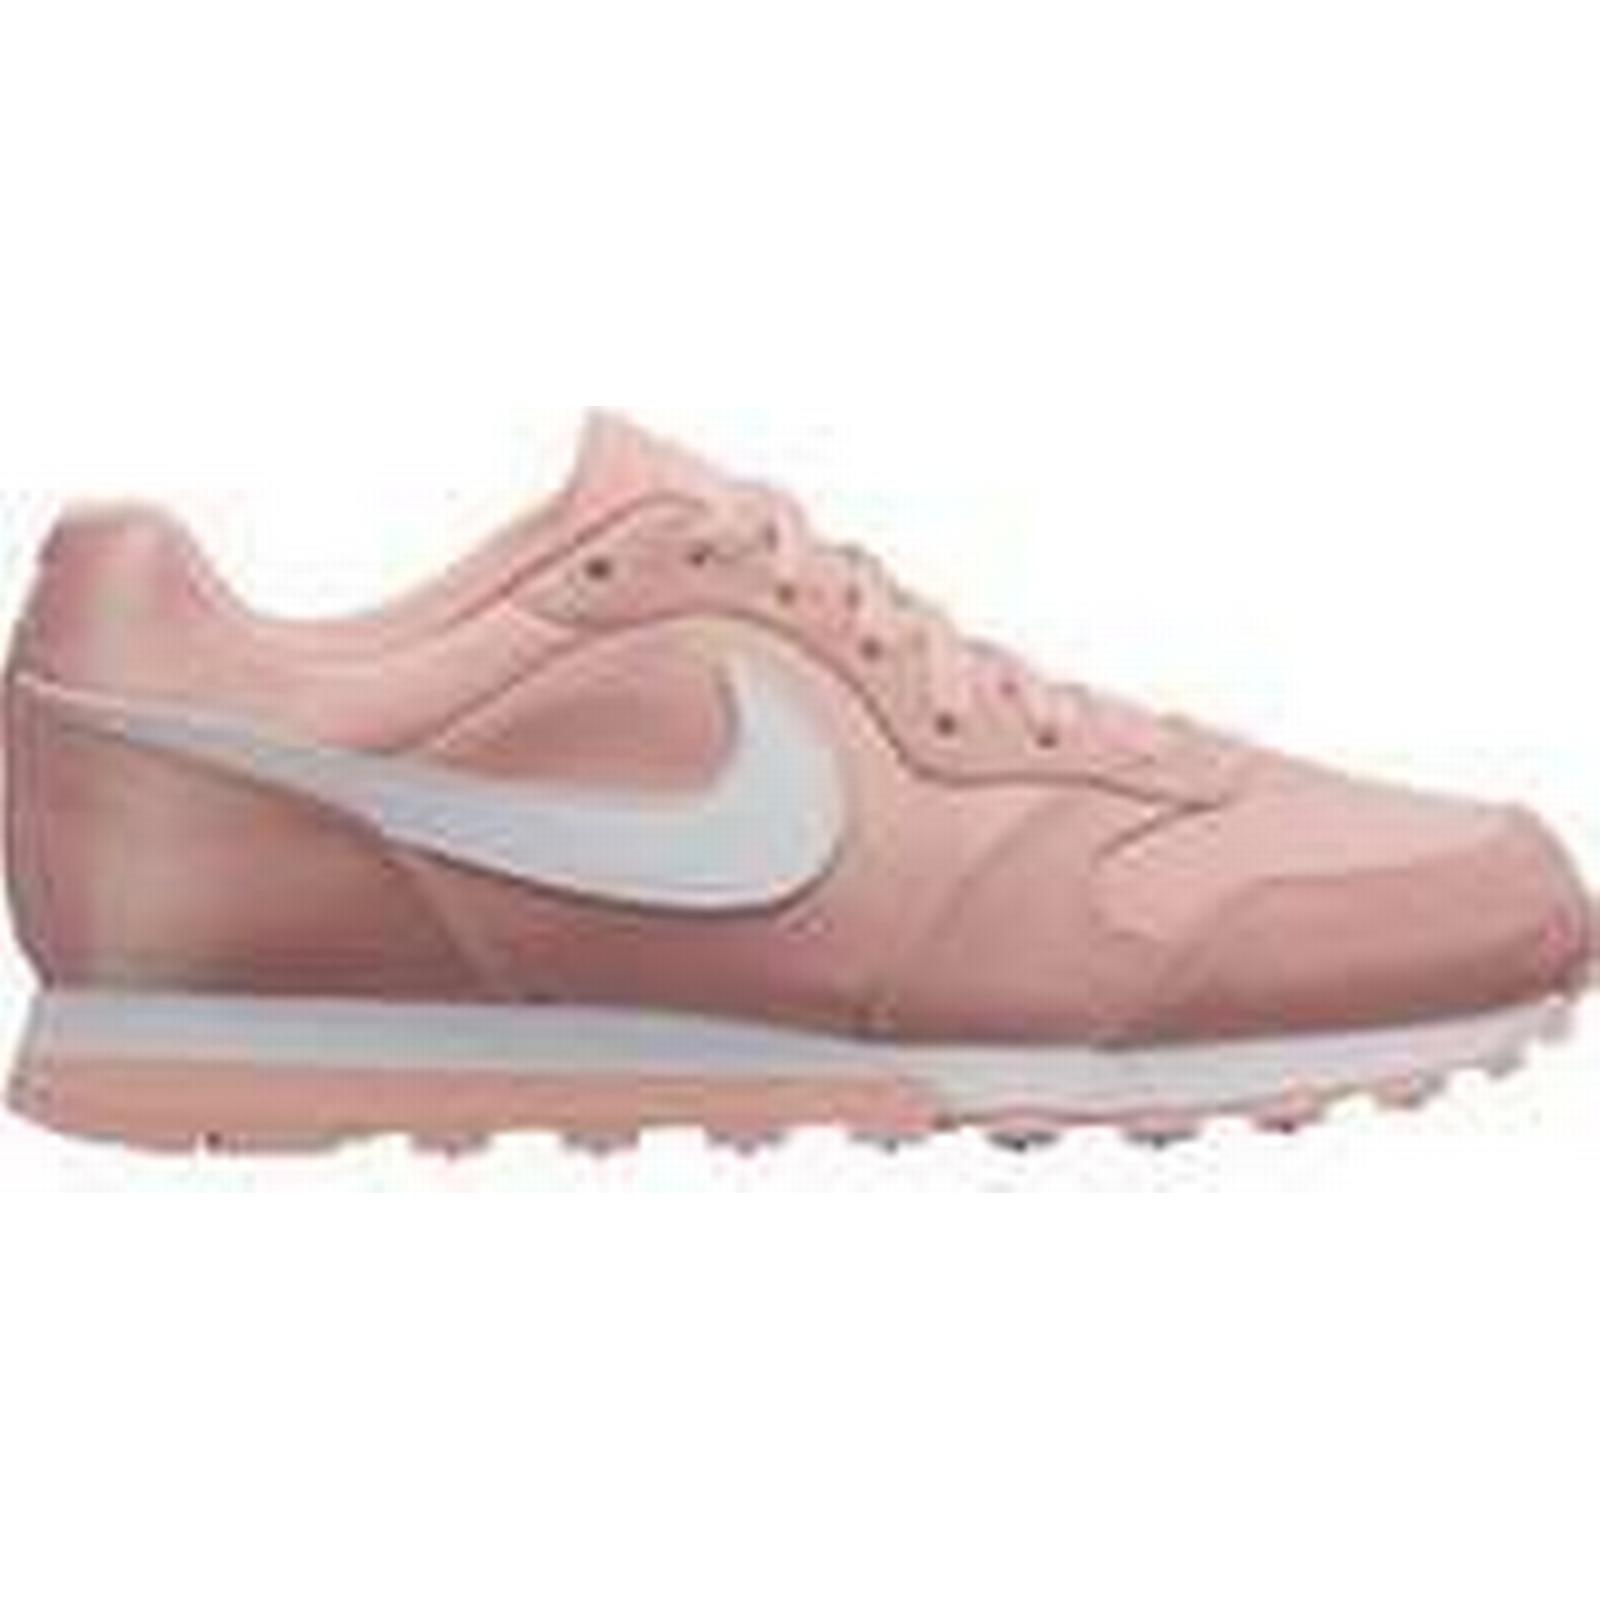 Nike ; S Femmes Spartoo Chaussure Runner Md Uk Amp; Pa7qdbpw Co trsCxQdh